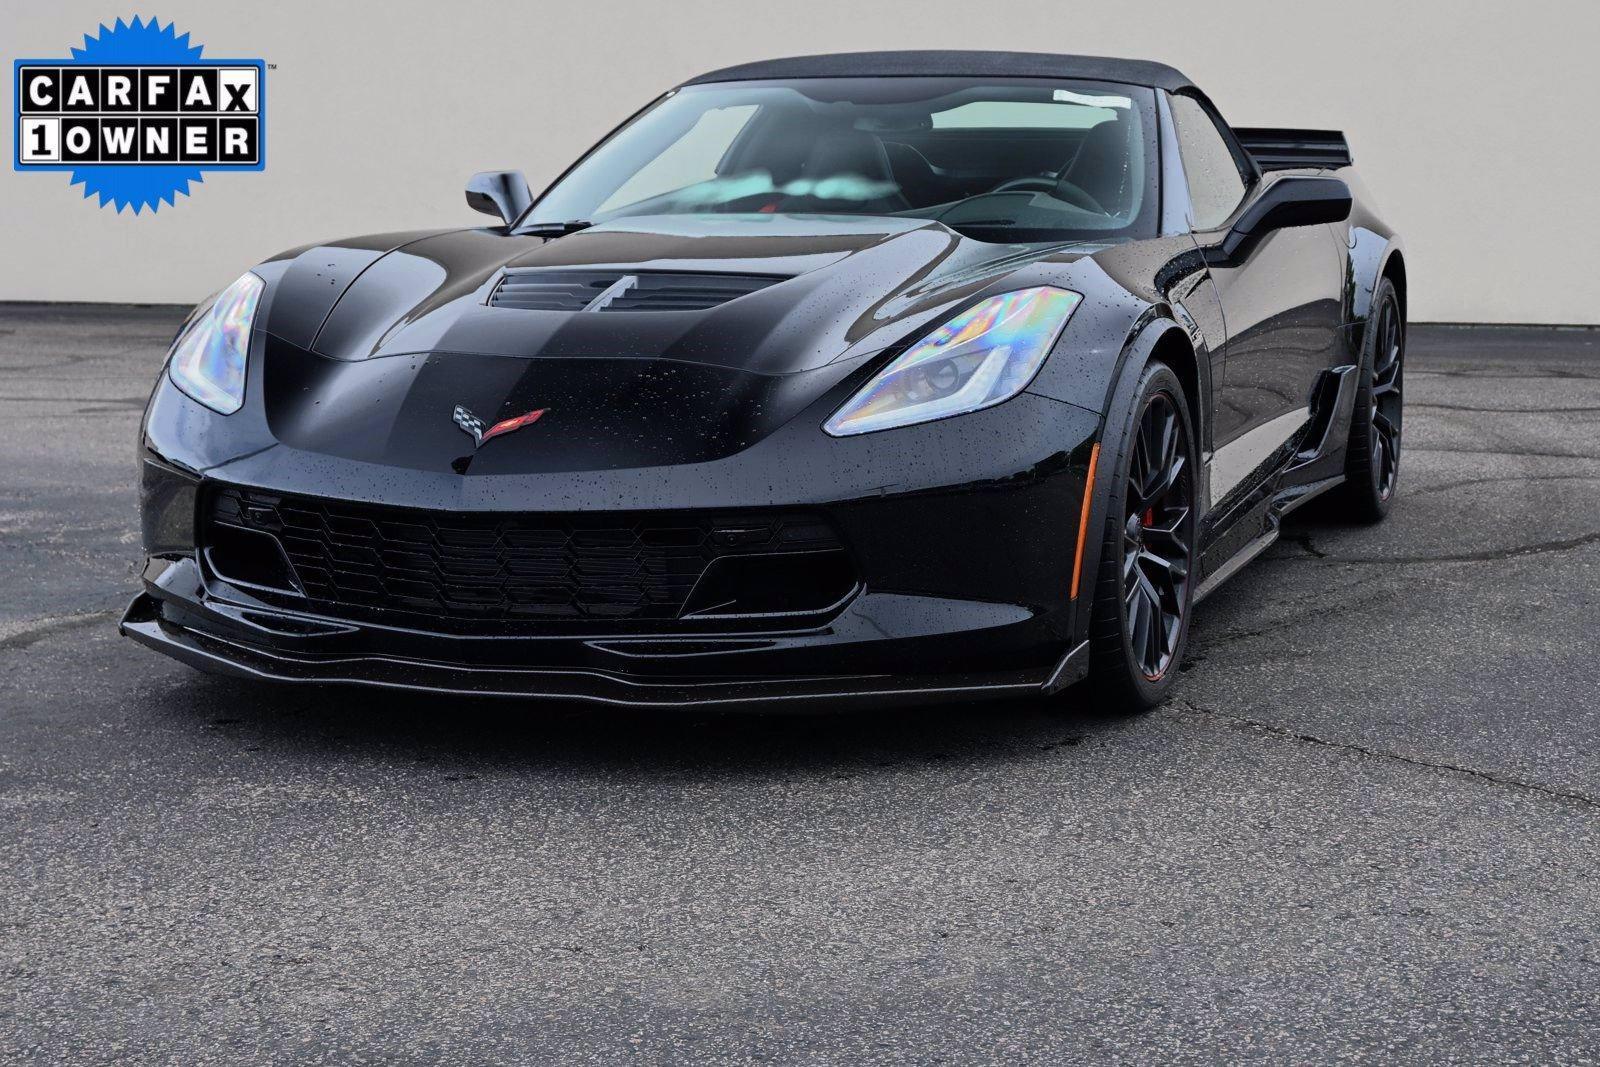 2019 Chevrolet Corvette Vehicle Photo in Norwood, MA 02062